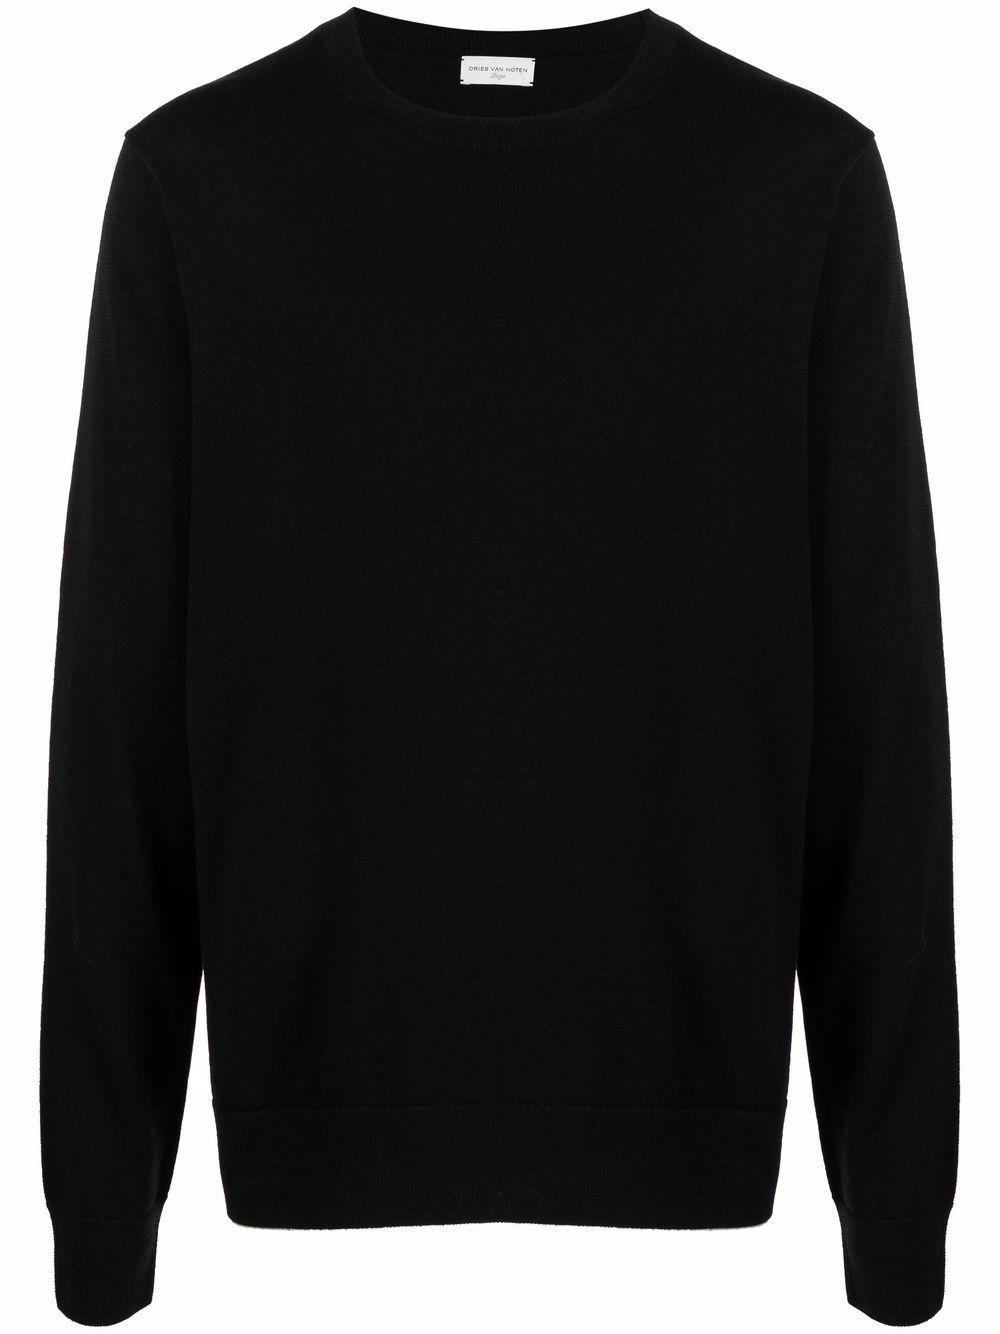 taxi sweater man black in wool DRIES VAN NOTEN | Sweaters | TAXI 3700900